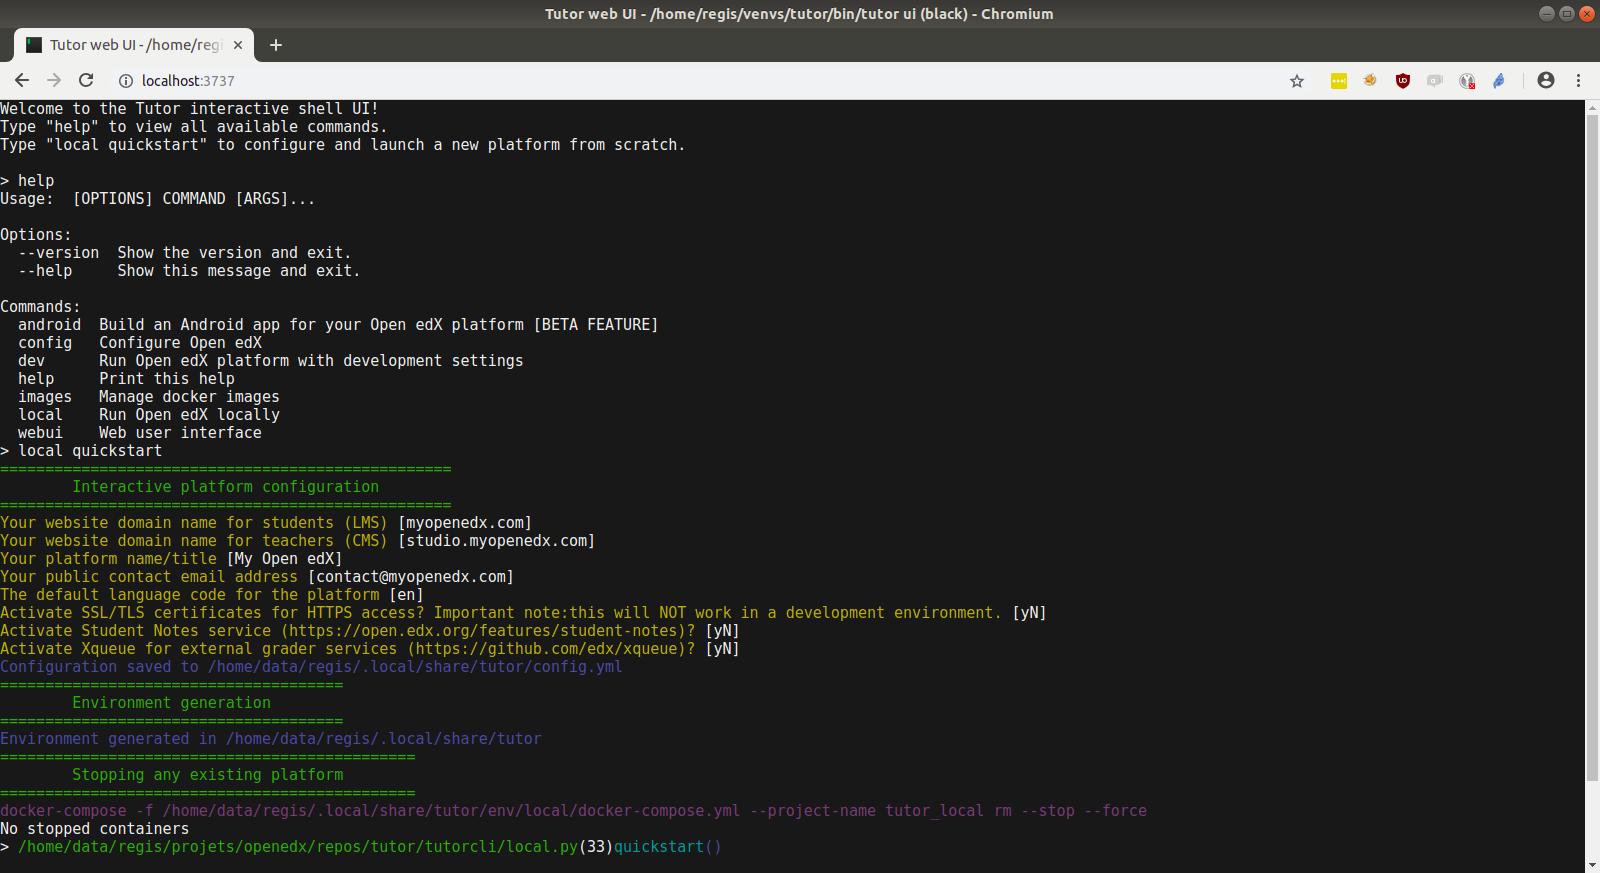 https://overhang.io/static/catalog/screenshots/webui.png